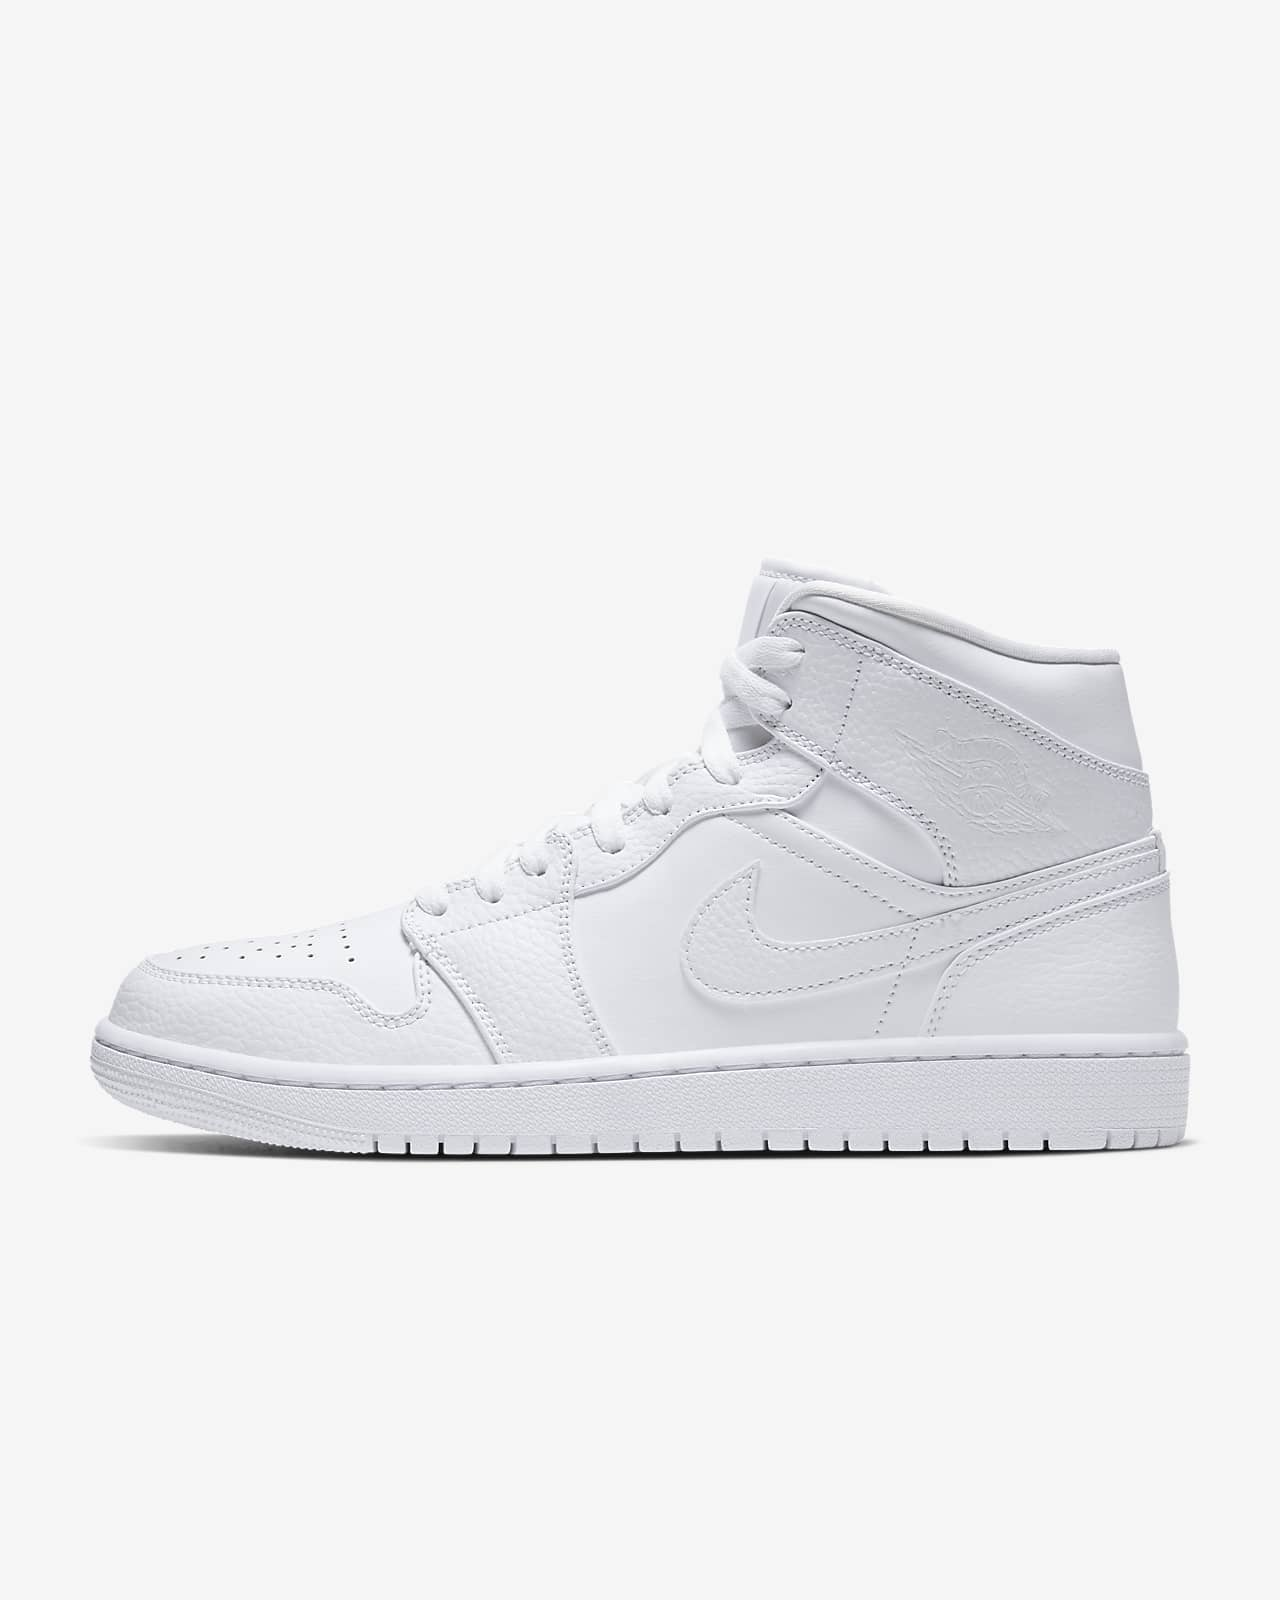 Air Jordan 1 Mid 'White'